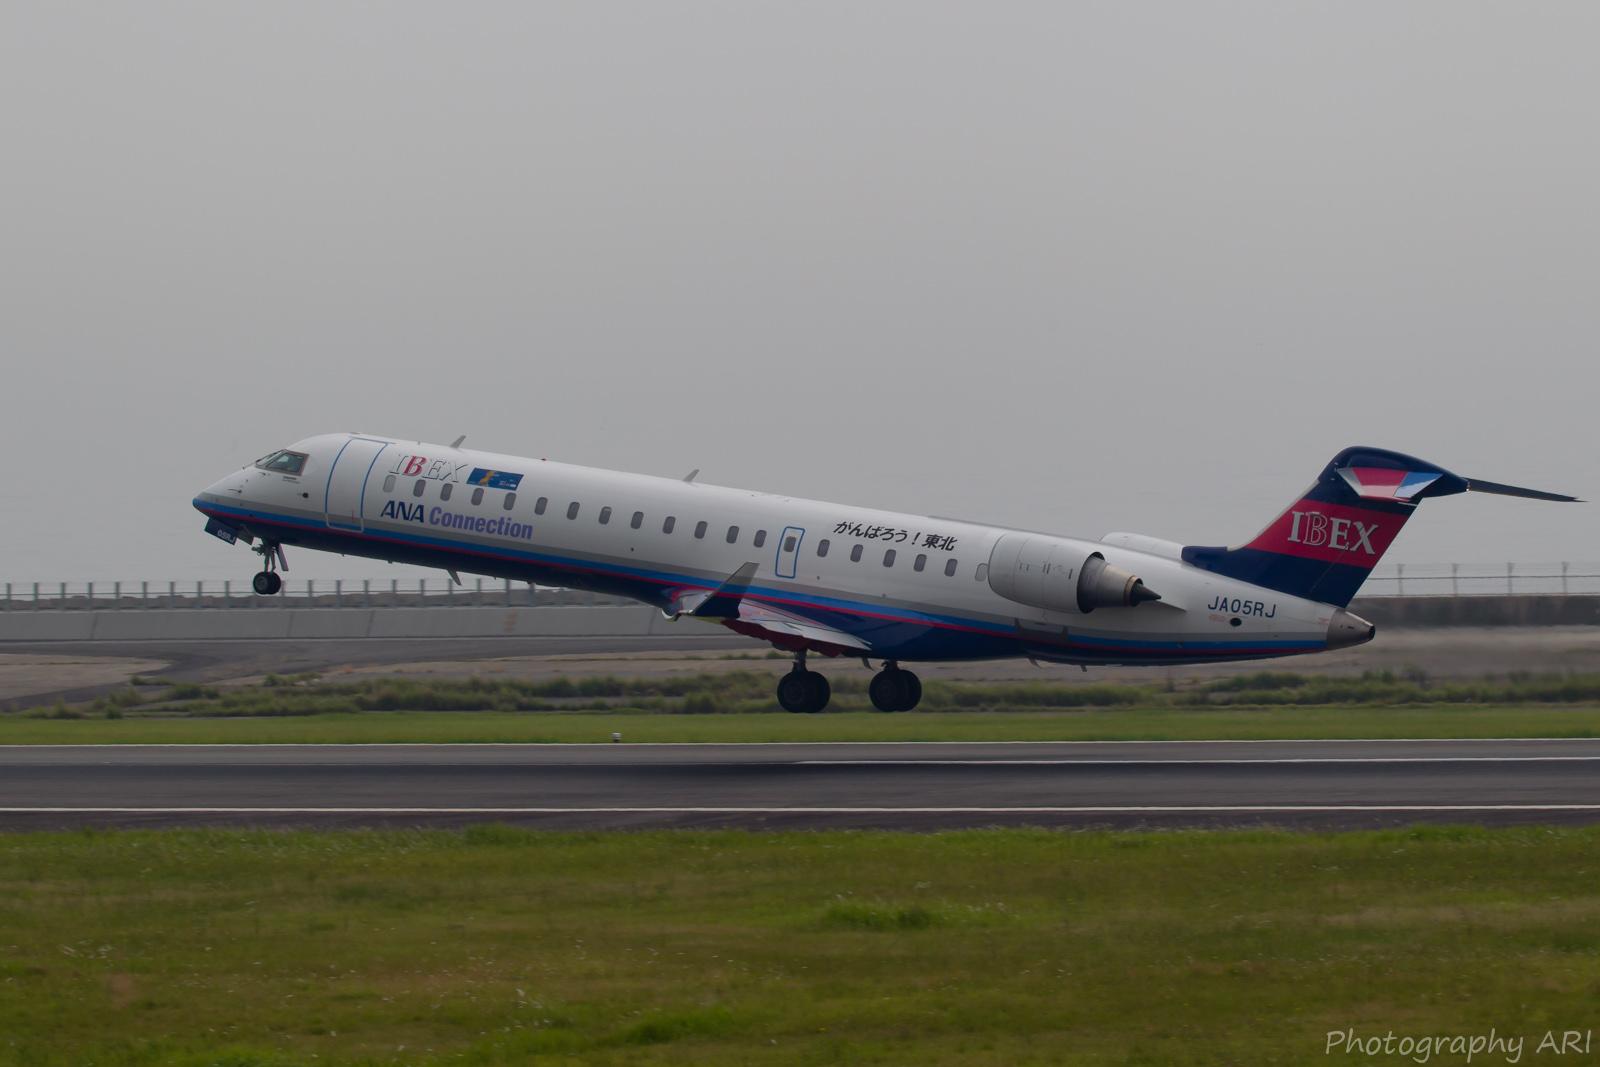 IBEX CRJ-700